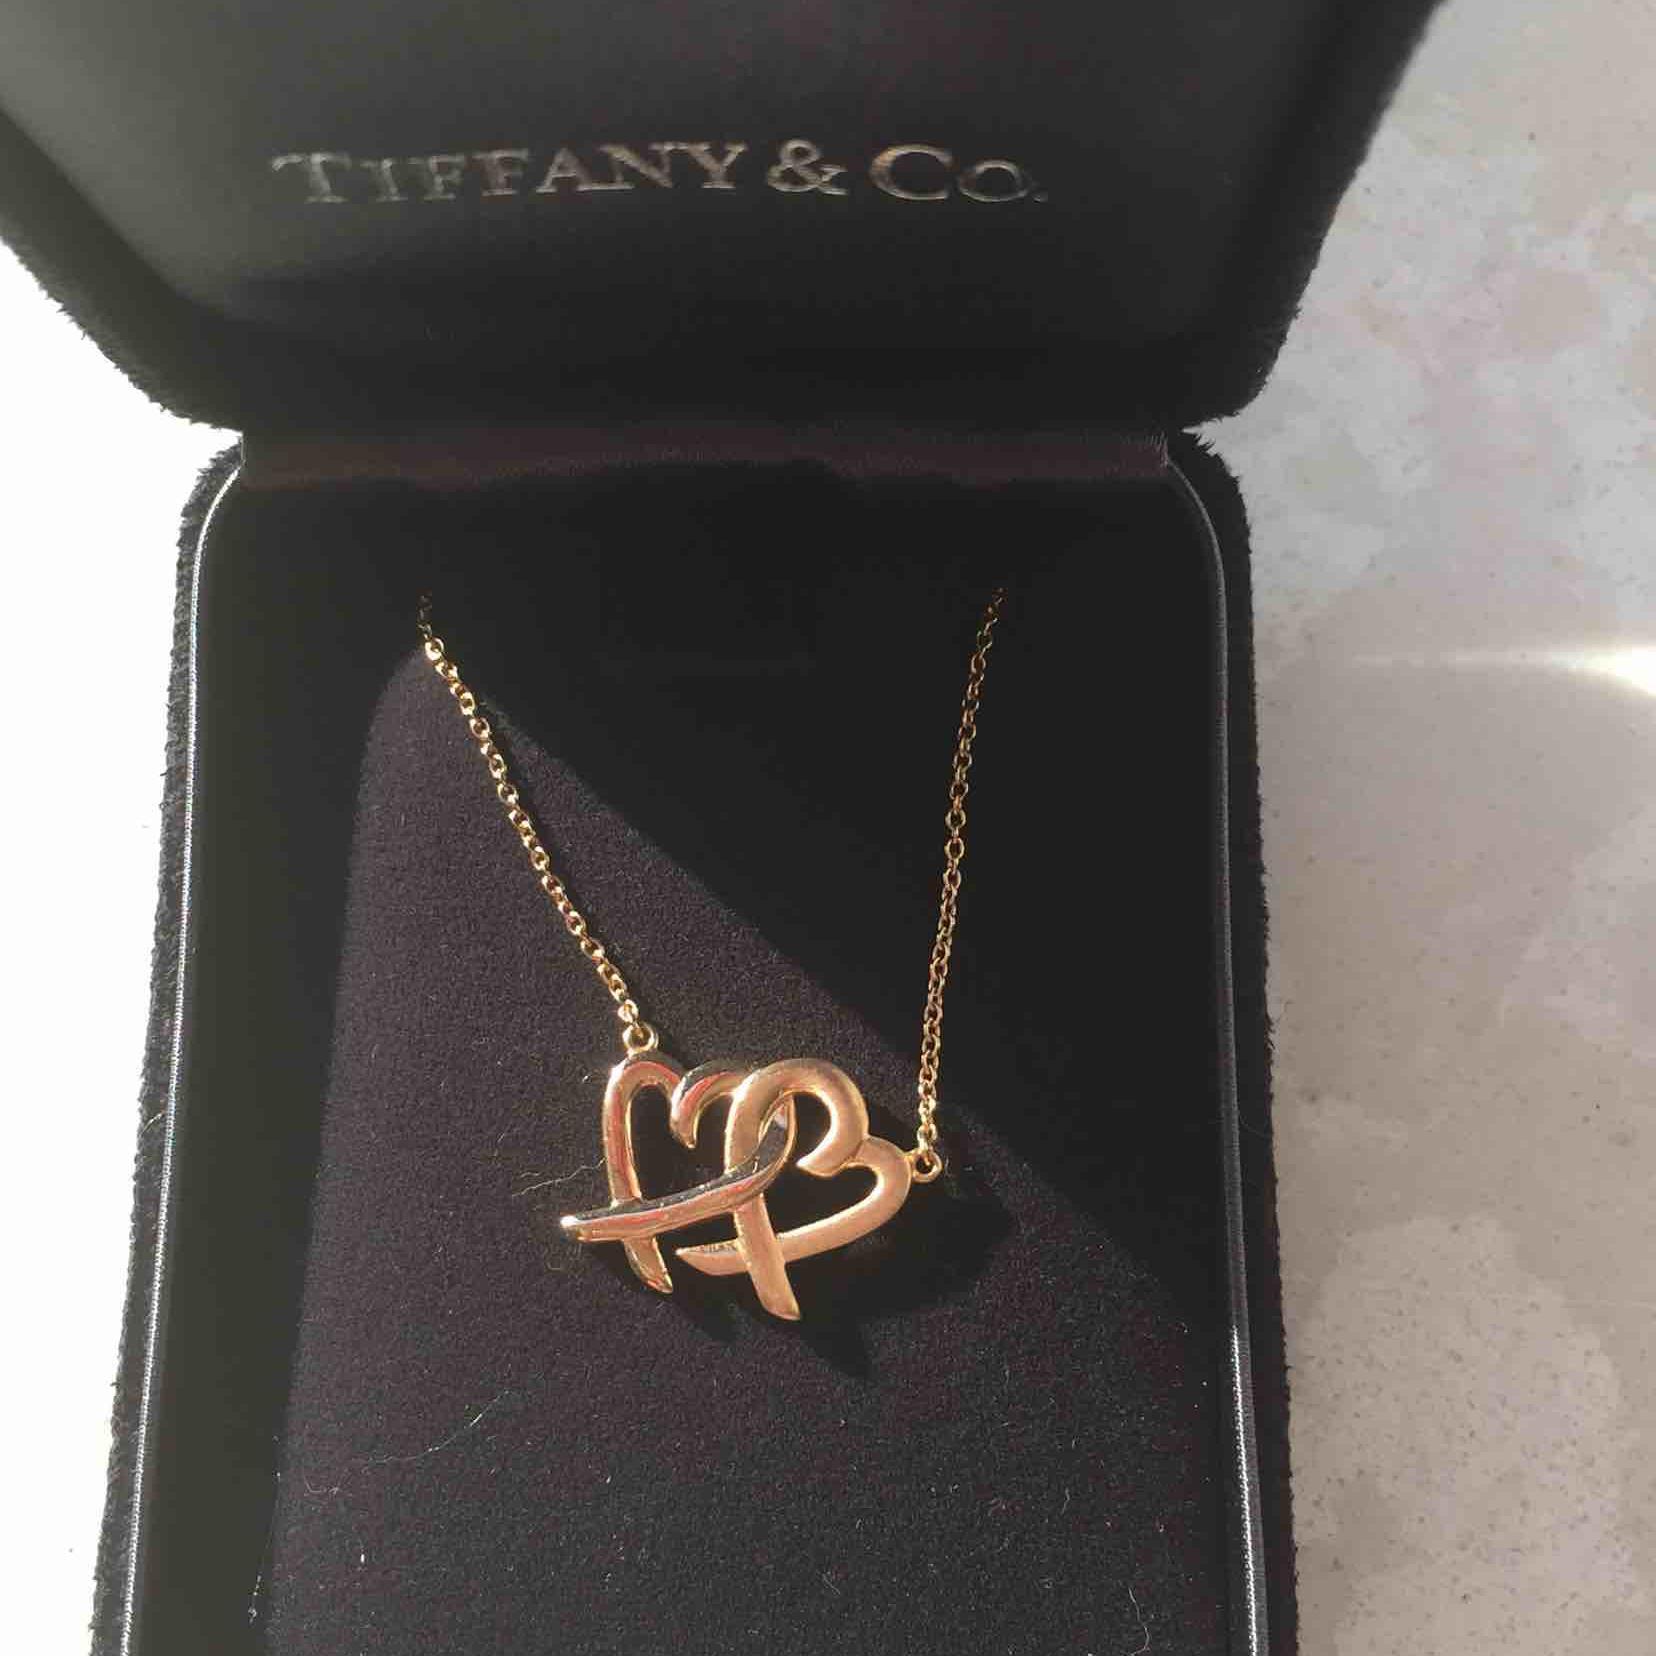 Tiffany蒂芙尼18k黄金项链